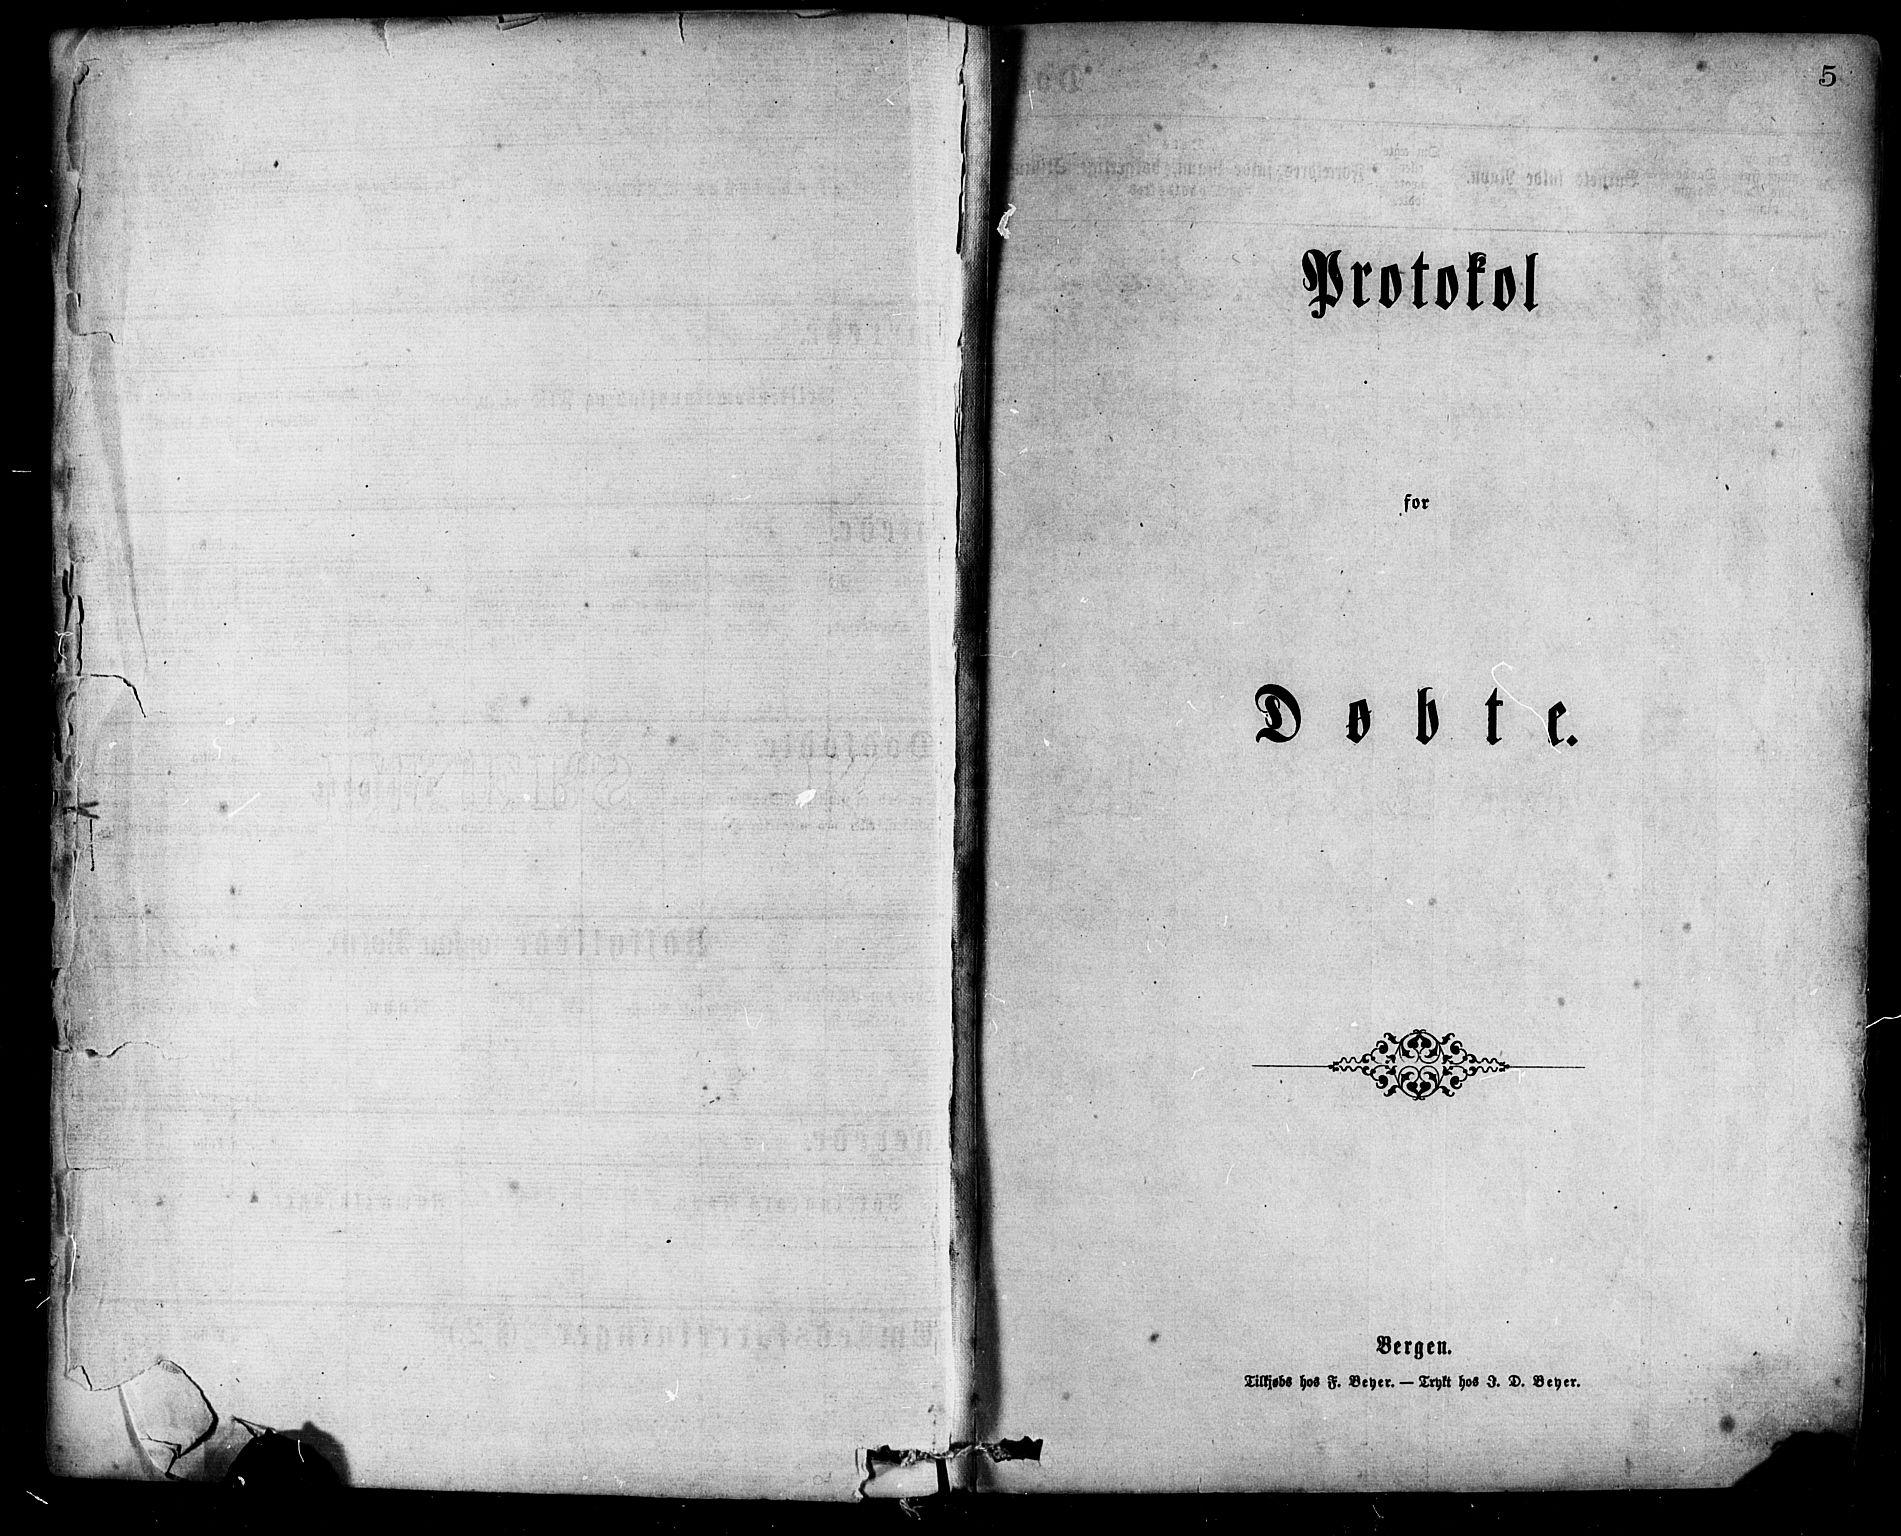 SAB, Hamre Sokneprestembete, H/Haa: Ministerialbok nr. A 15, 1870-1881, s. 5